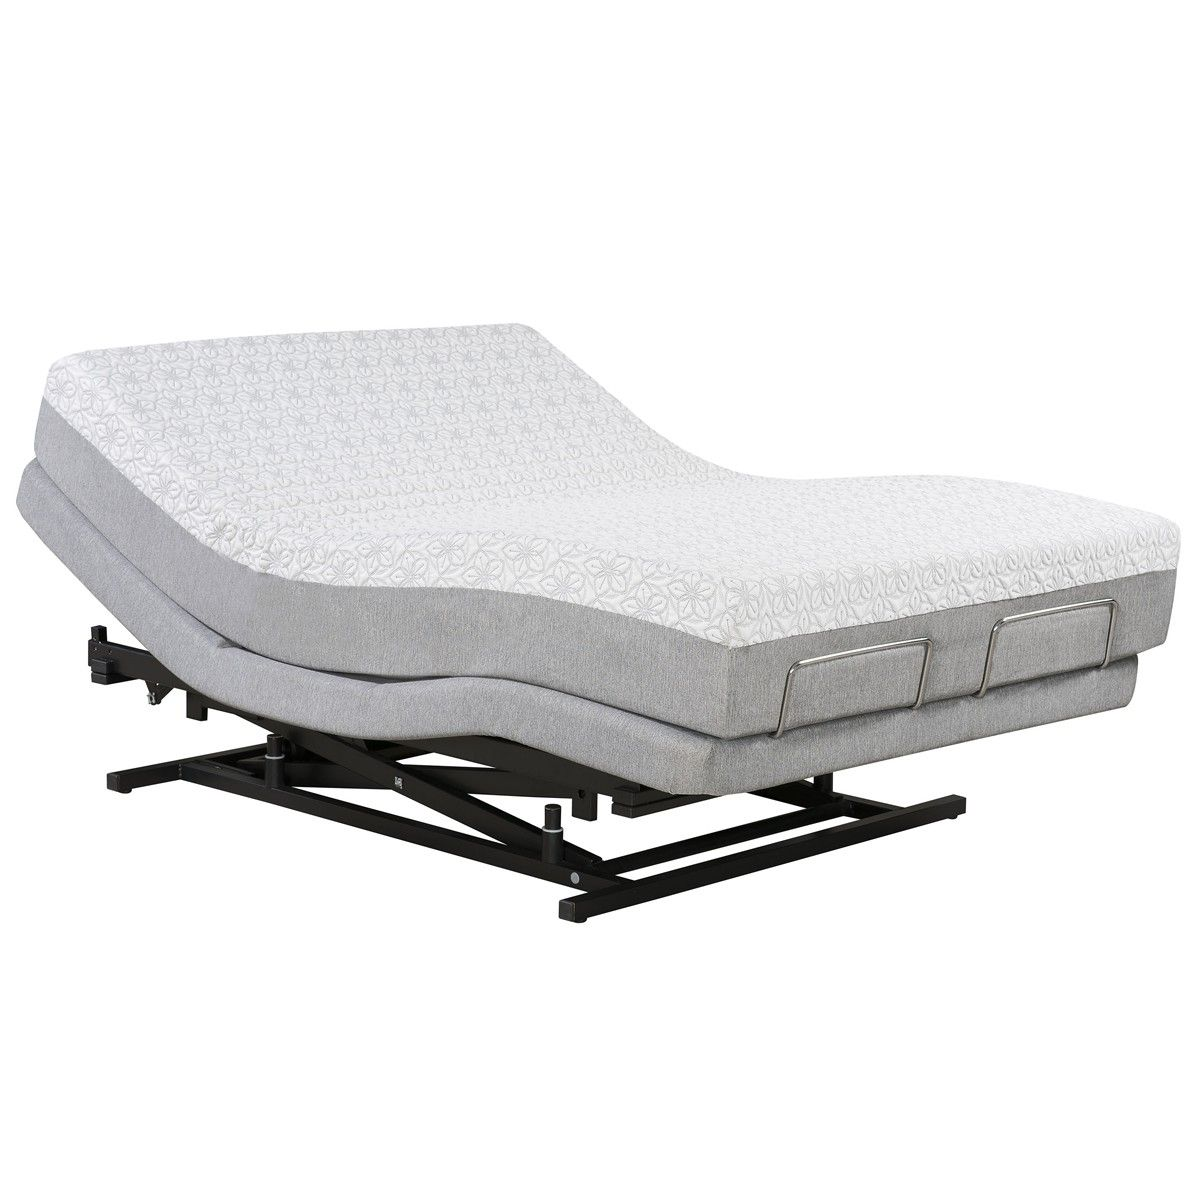 Kalmia Perfect Height Hilow Adjustable Bed Adjustable